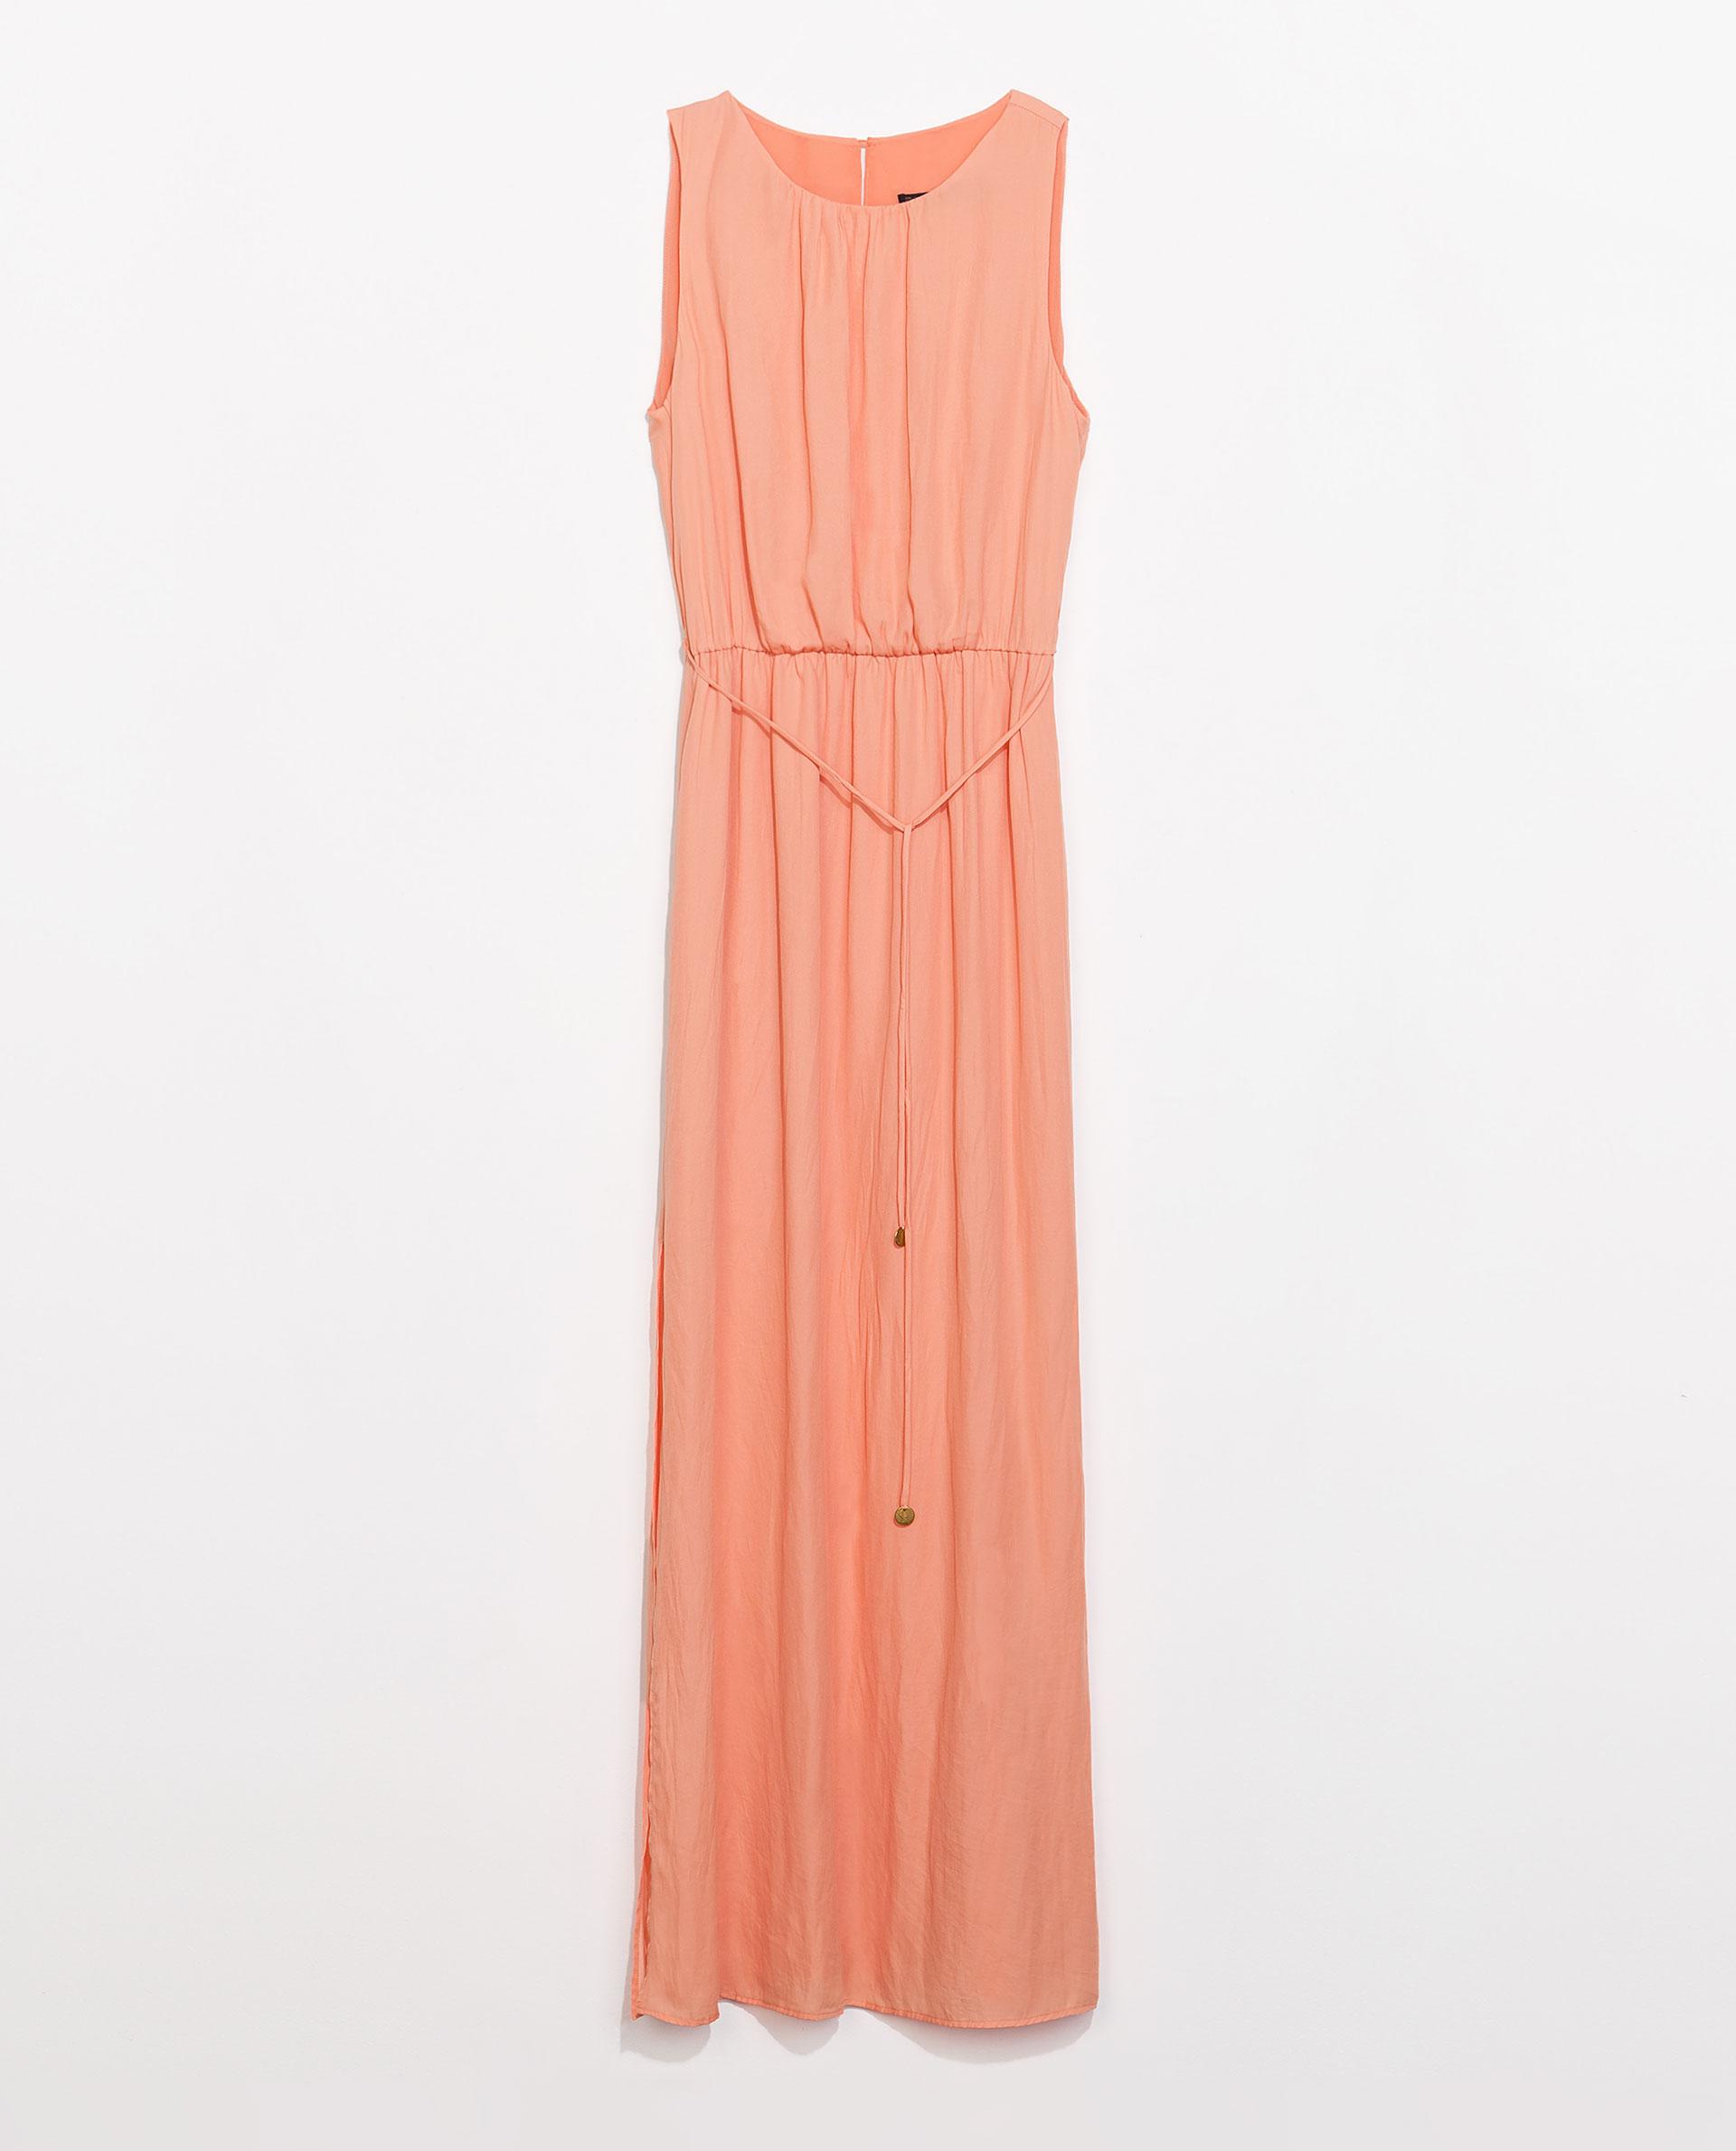 Zara Maxi Dress with Belt in Orange | Lyst